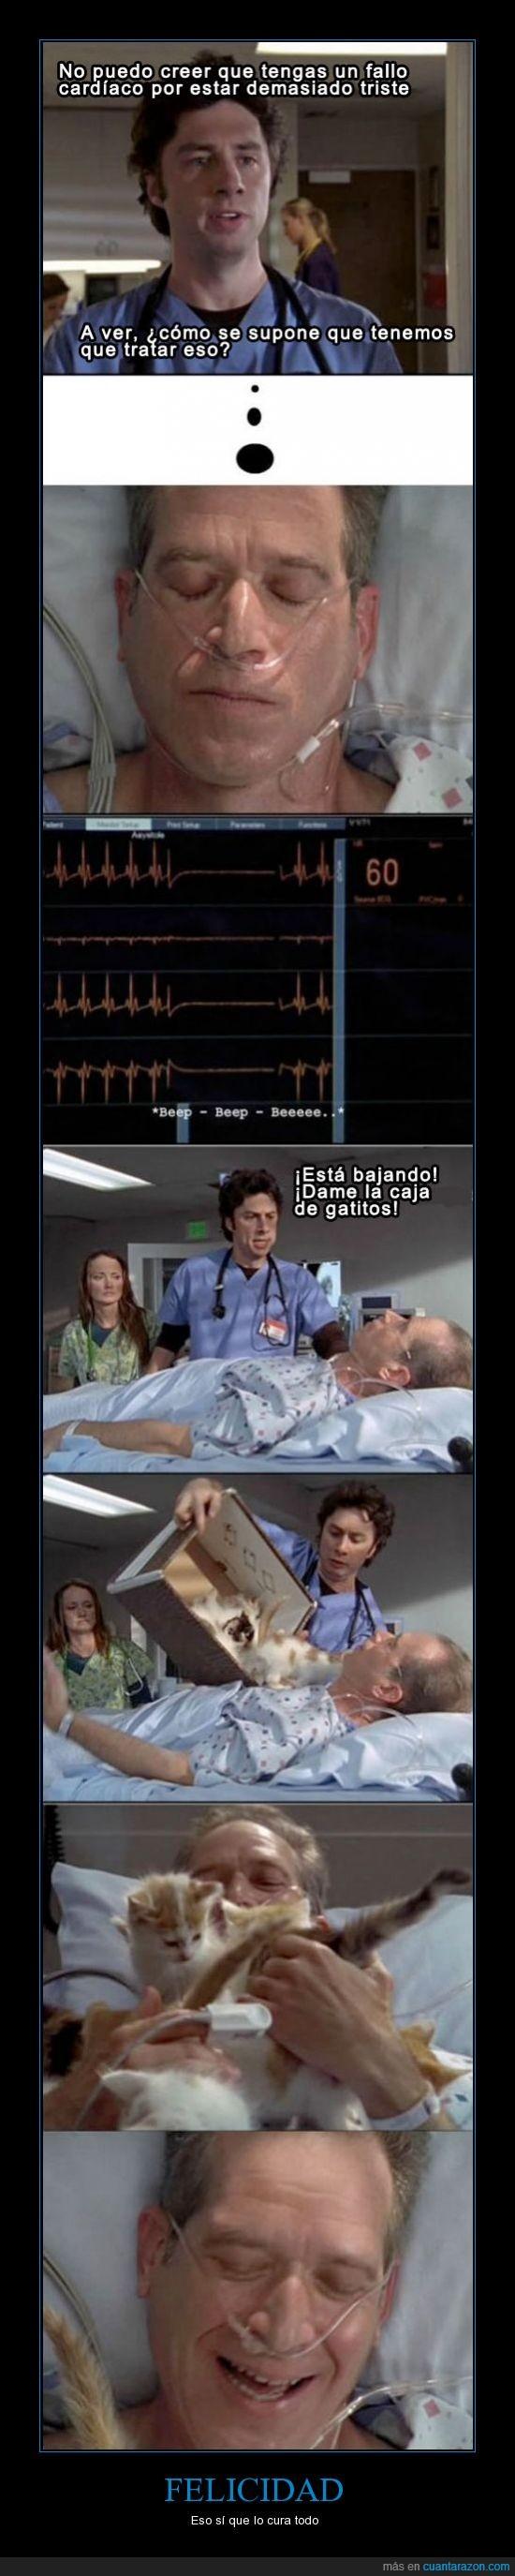 caja,corazon,encima,gatito,hospital,jd,paciente,scrubs,triste